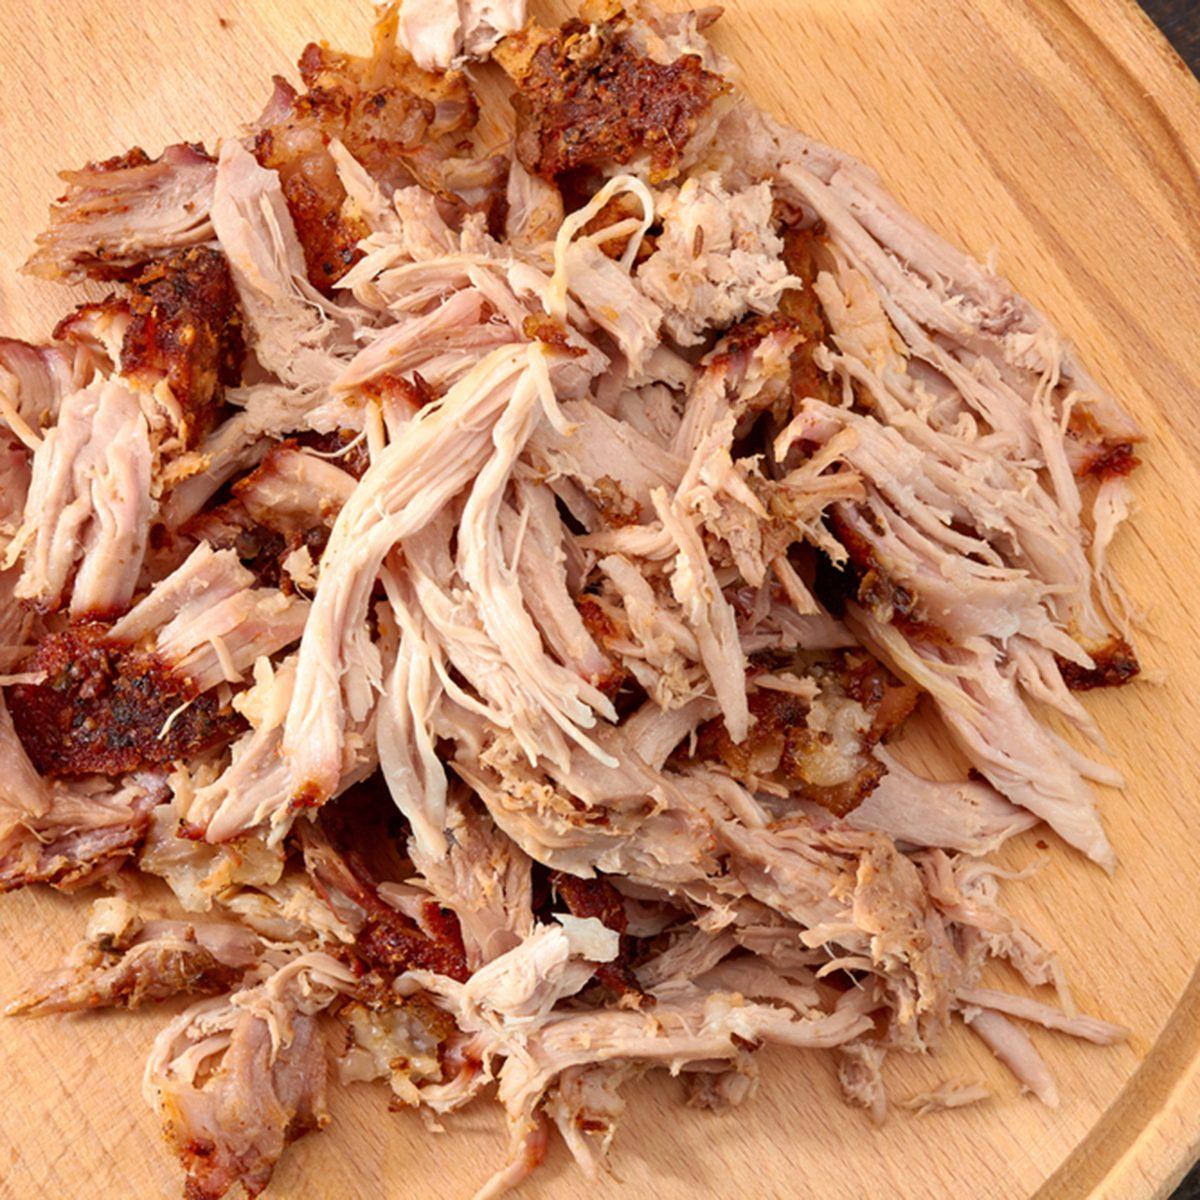 Pulled pork on round wooden board